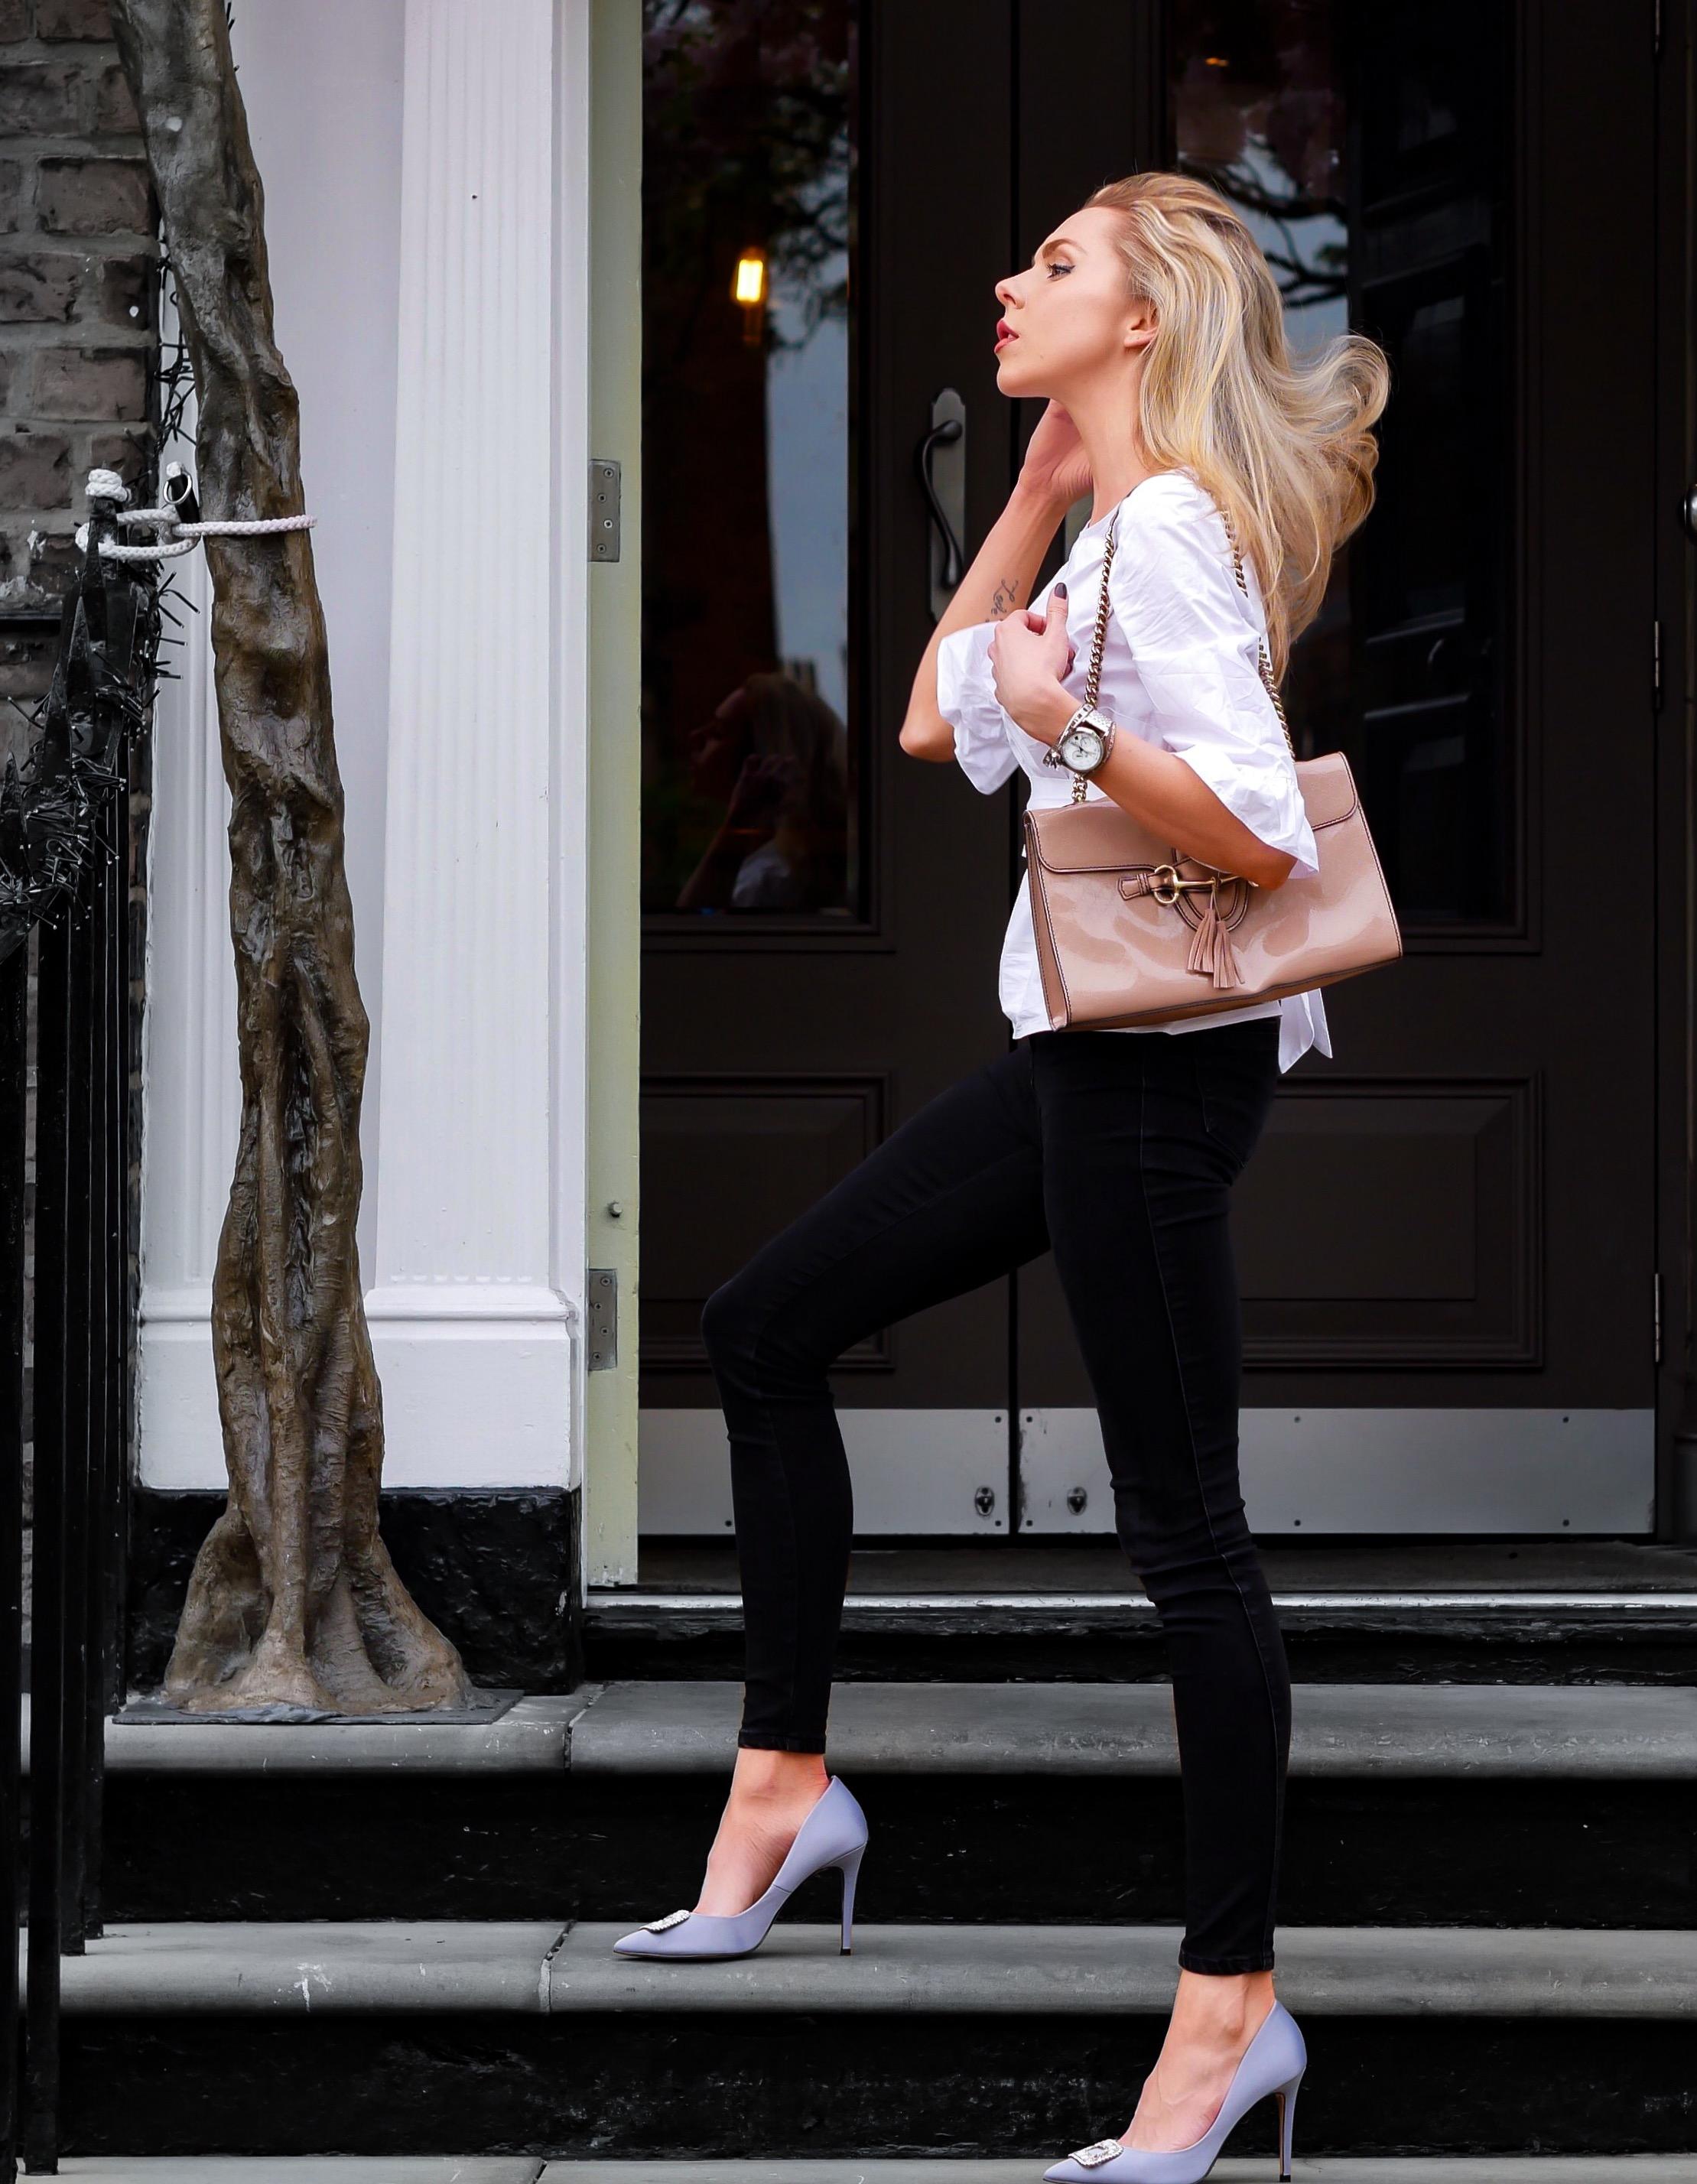 haul, affordable fashion, streetstyle, inspiration, what to wear, fashion, lookbook, style, fashion blogger, laura blair, youtuber, london fashion girl, debenhams, red, jasper conran